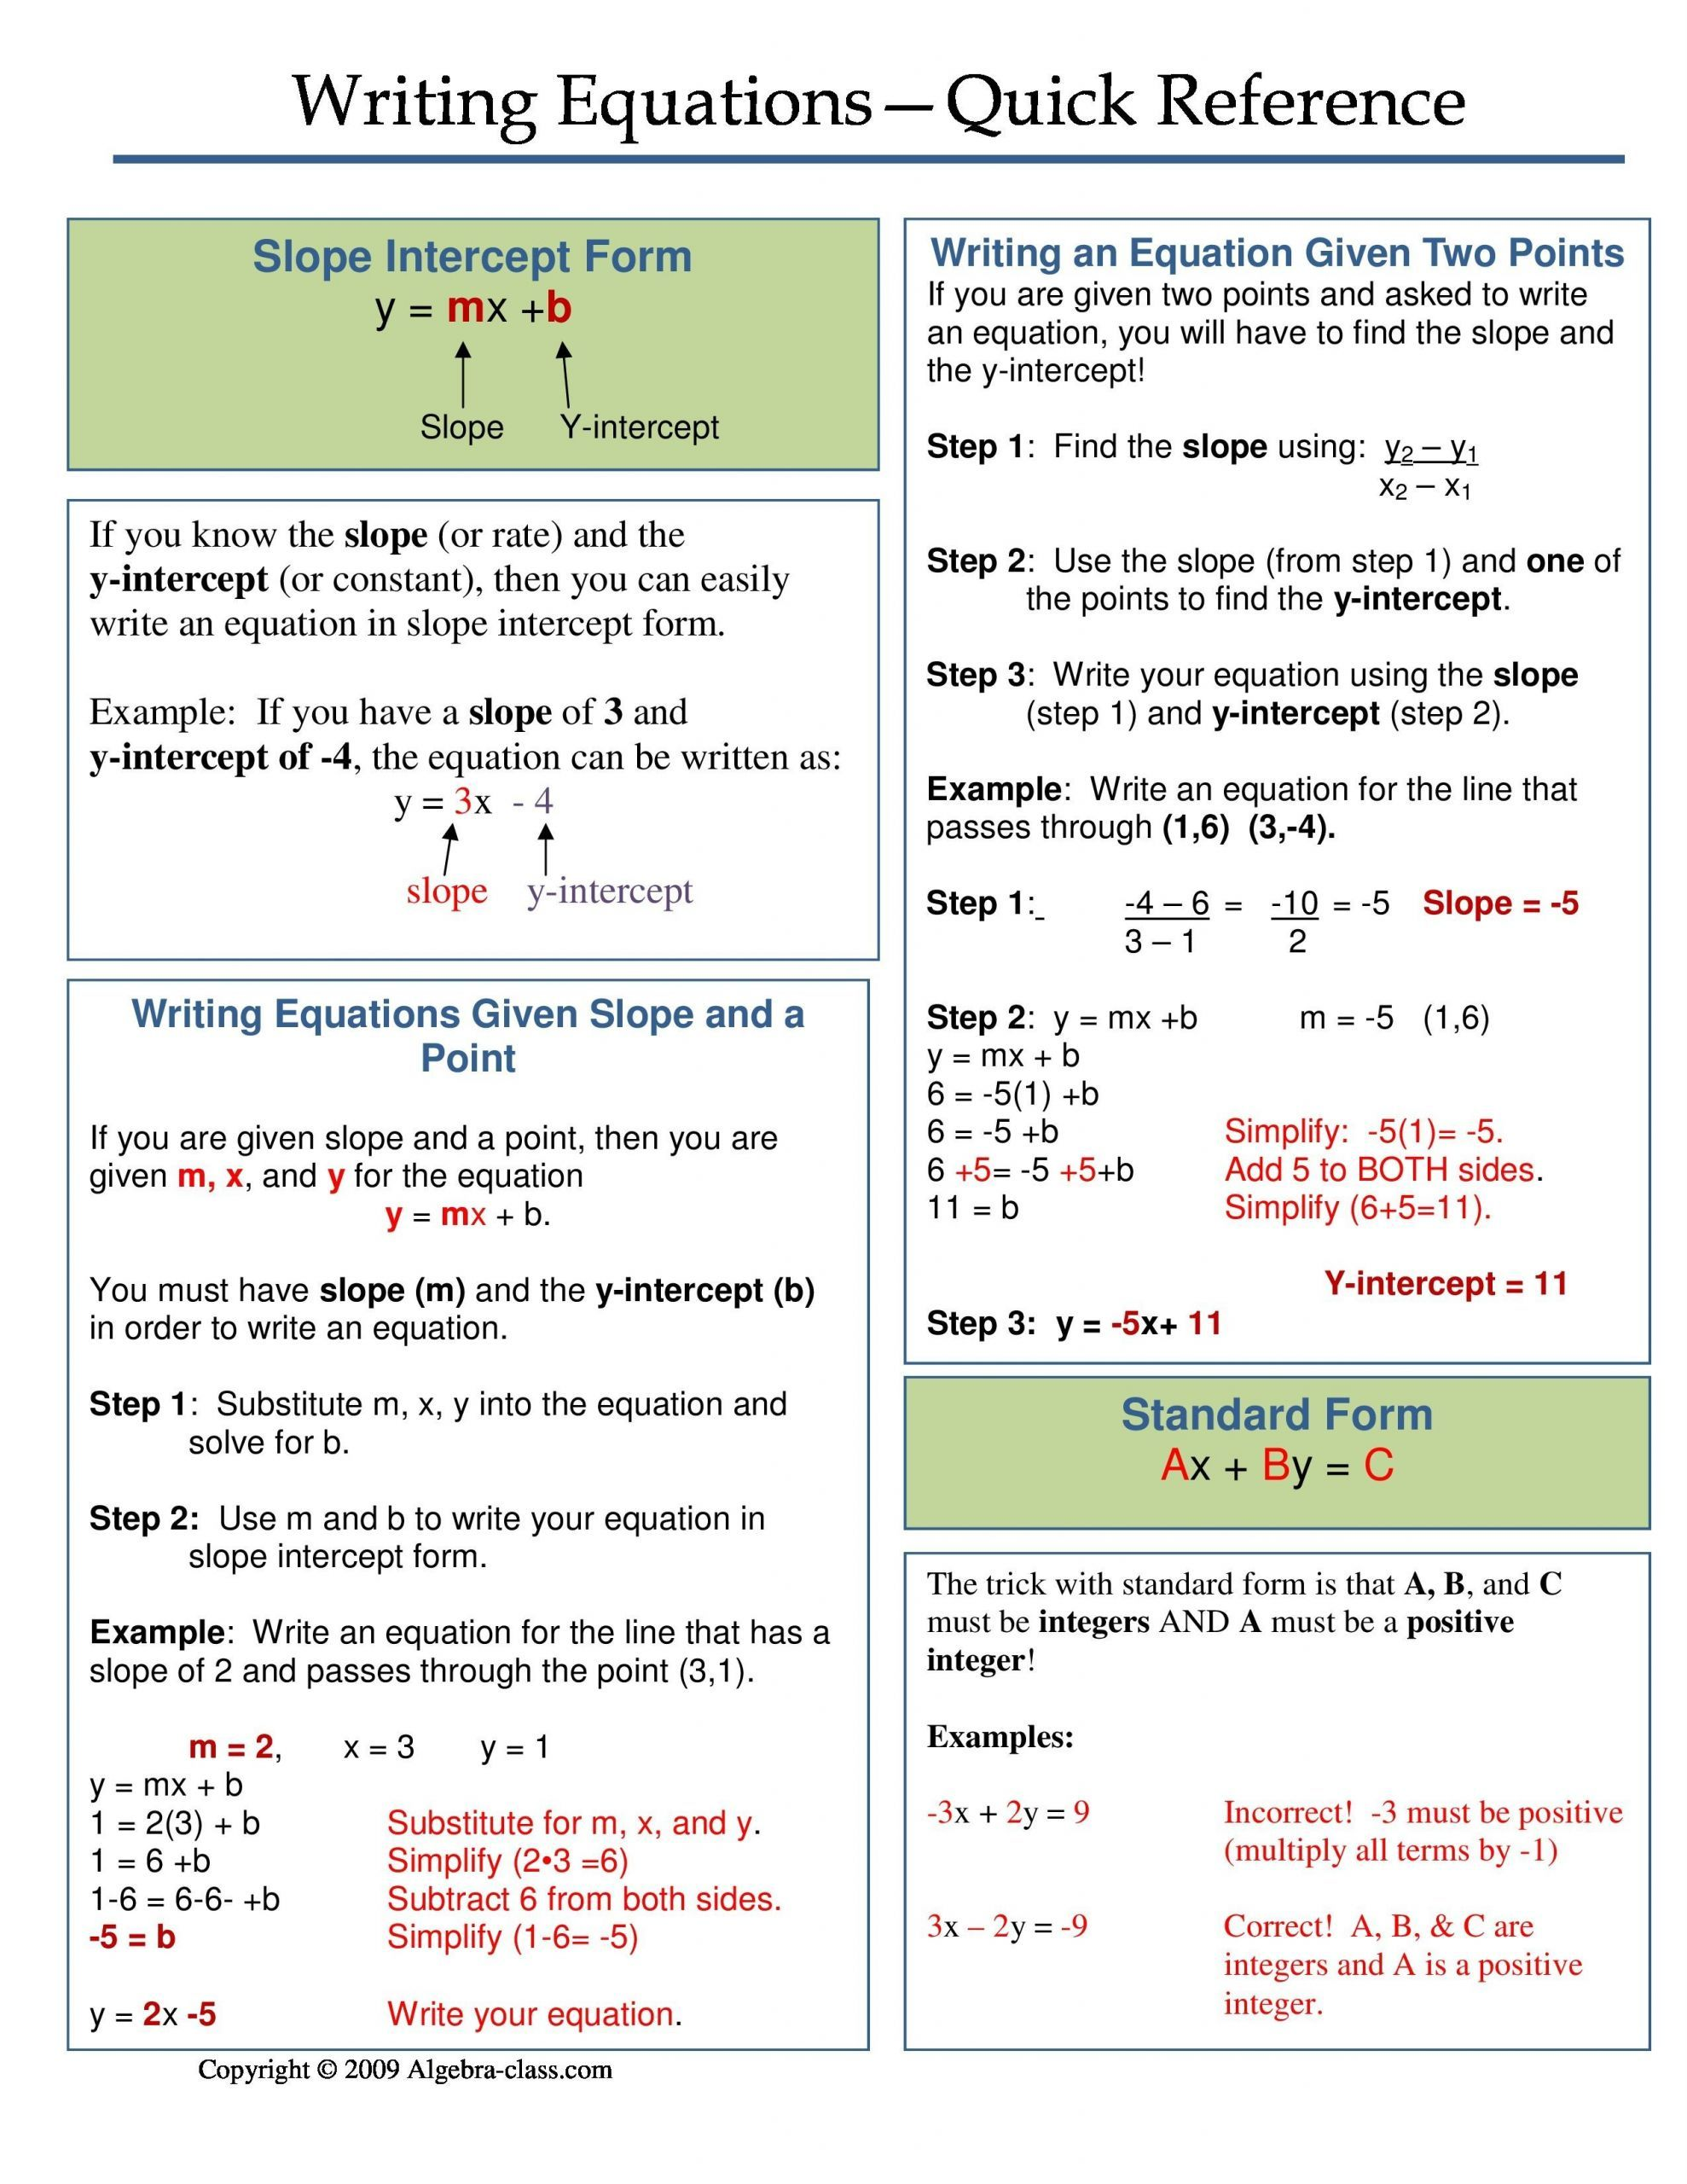 6 Legal 8th Grade Pre Algebra Worksheets In 2020 Writing Equations Teaching Algebra Teaching Math